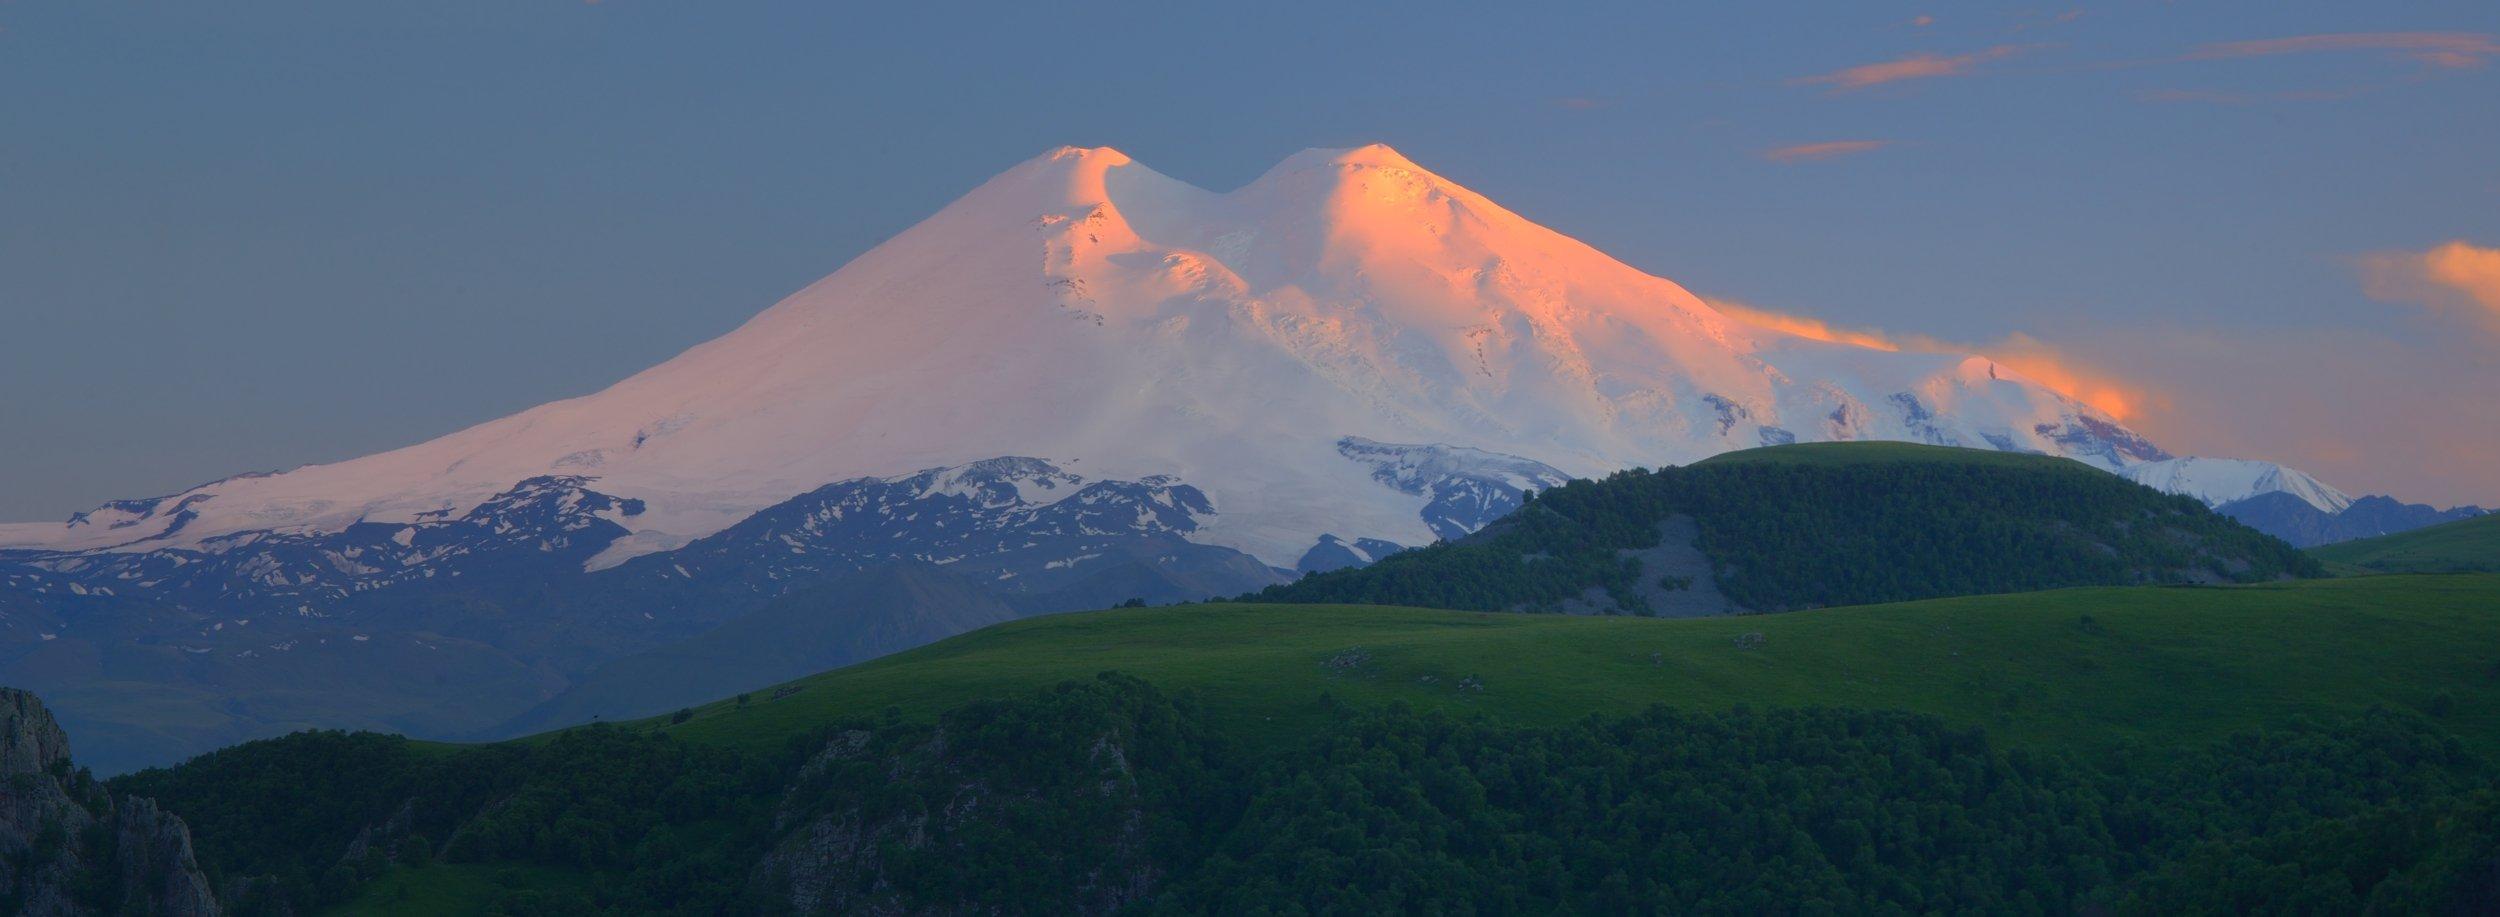 горы лето кавказ эльбрус, Александр Жарников